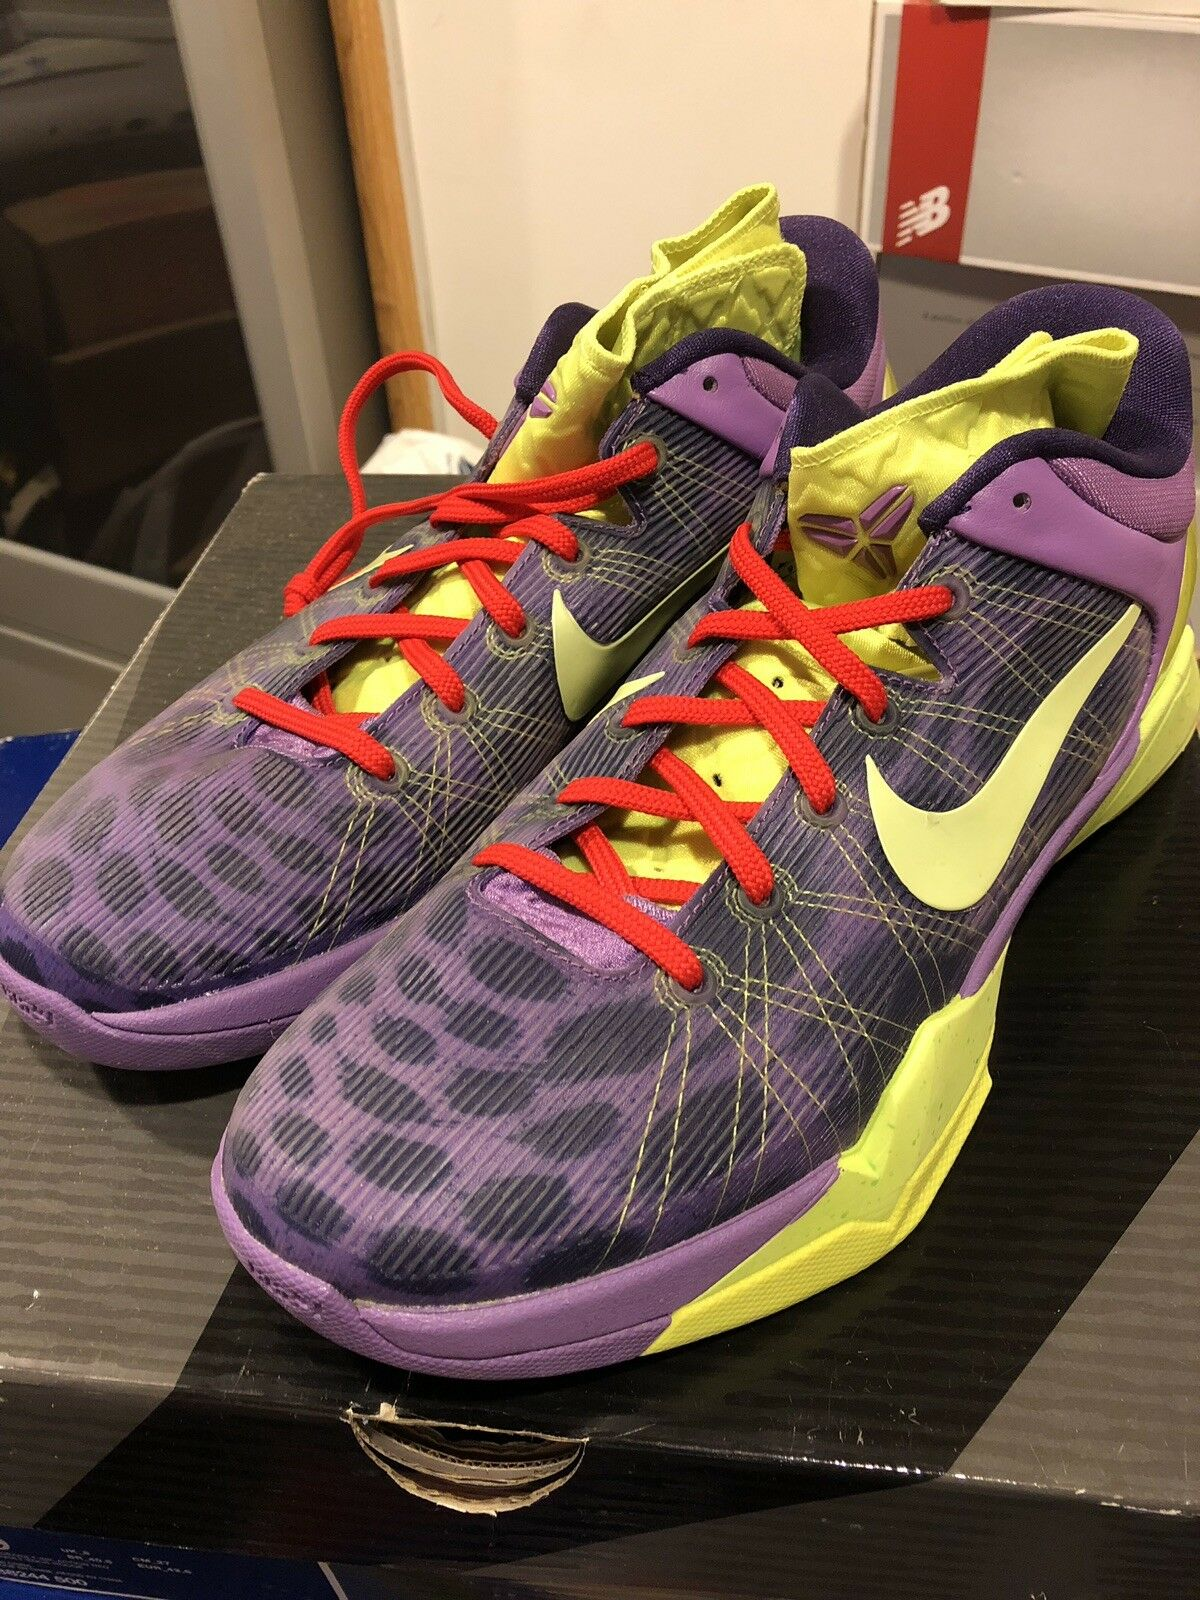 Nike Kobe 7 Vii Cheetah 6 Vi Grinch SB Supreme Galaxy Giuseppe Yeezy Jordan 11